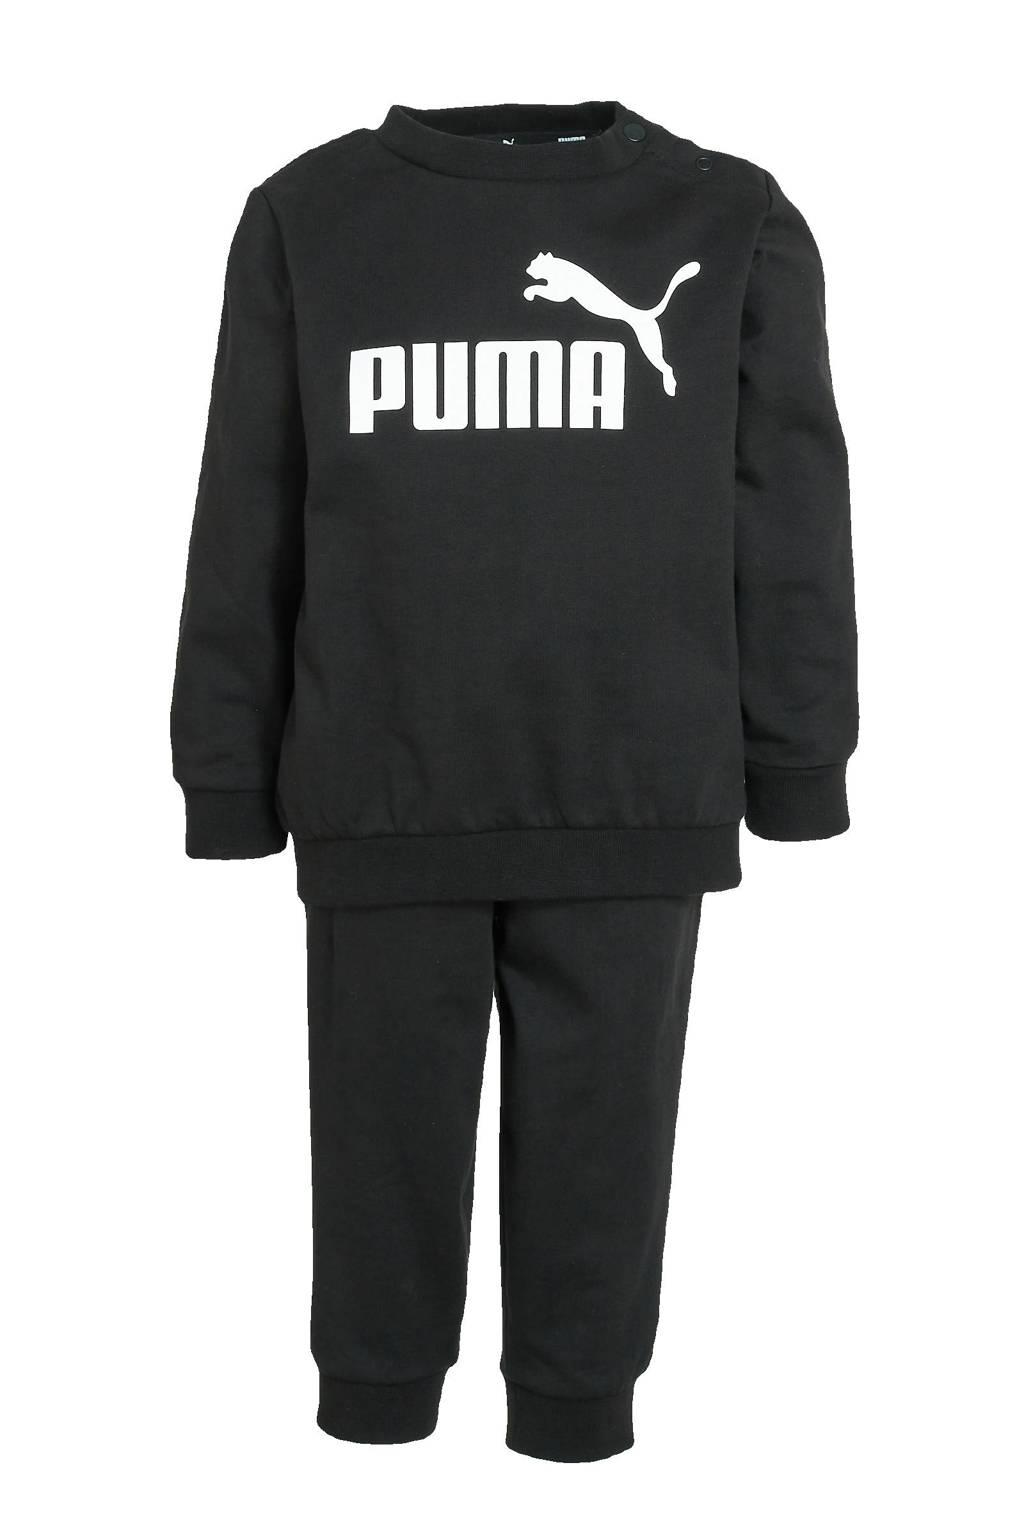 Puma   trainingspak zwart, Zwart